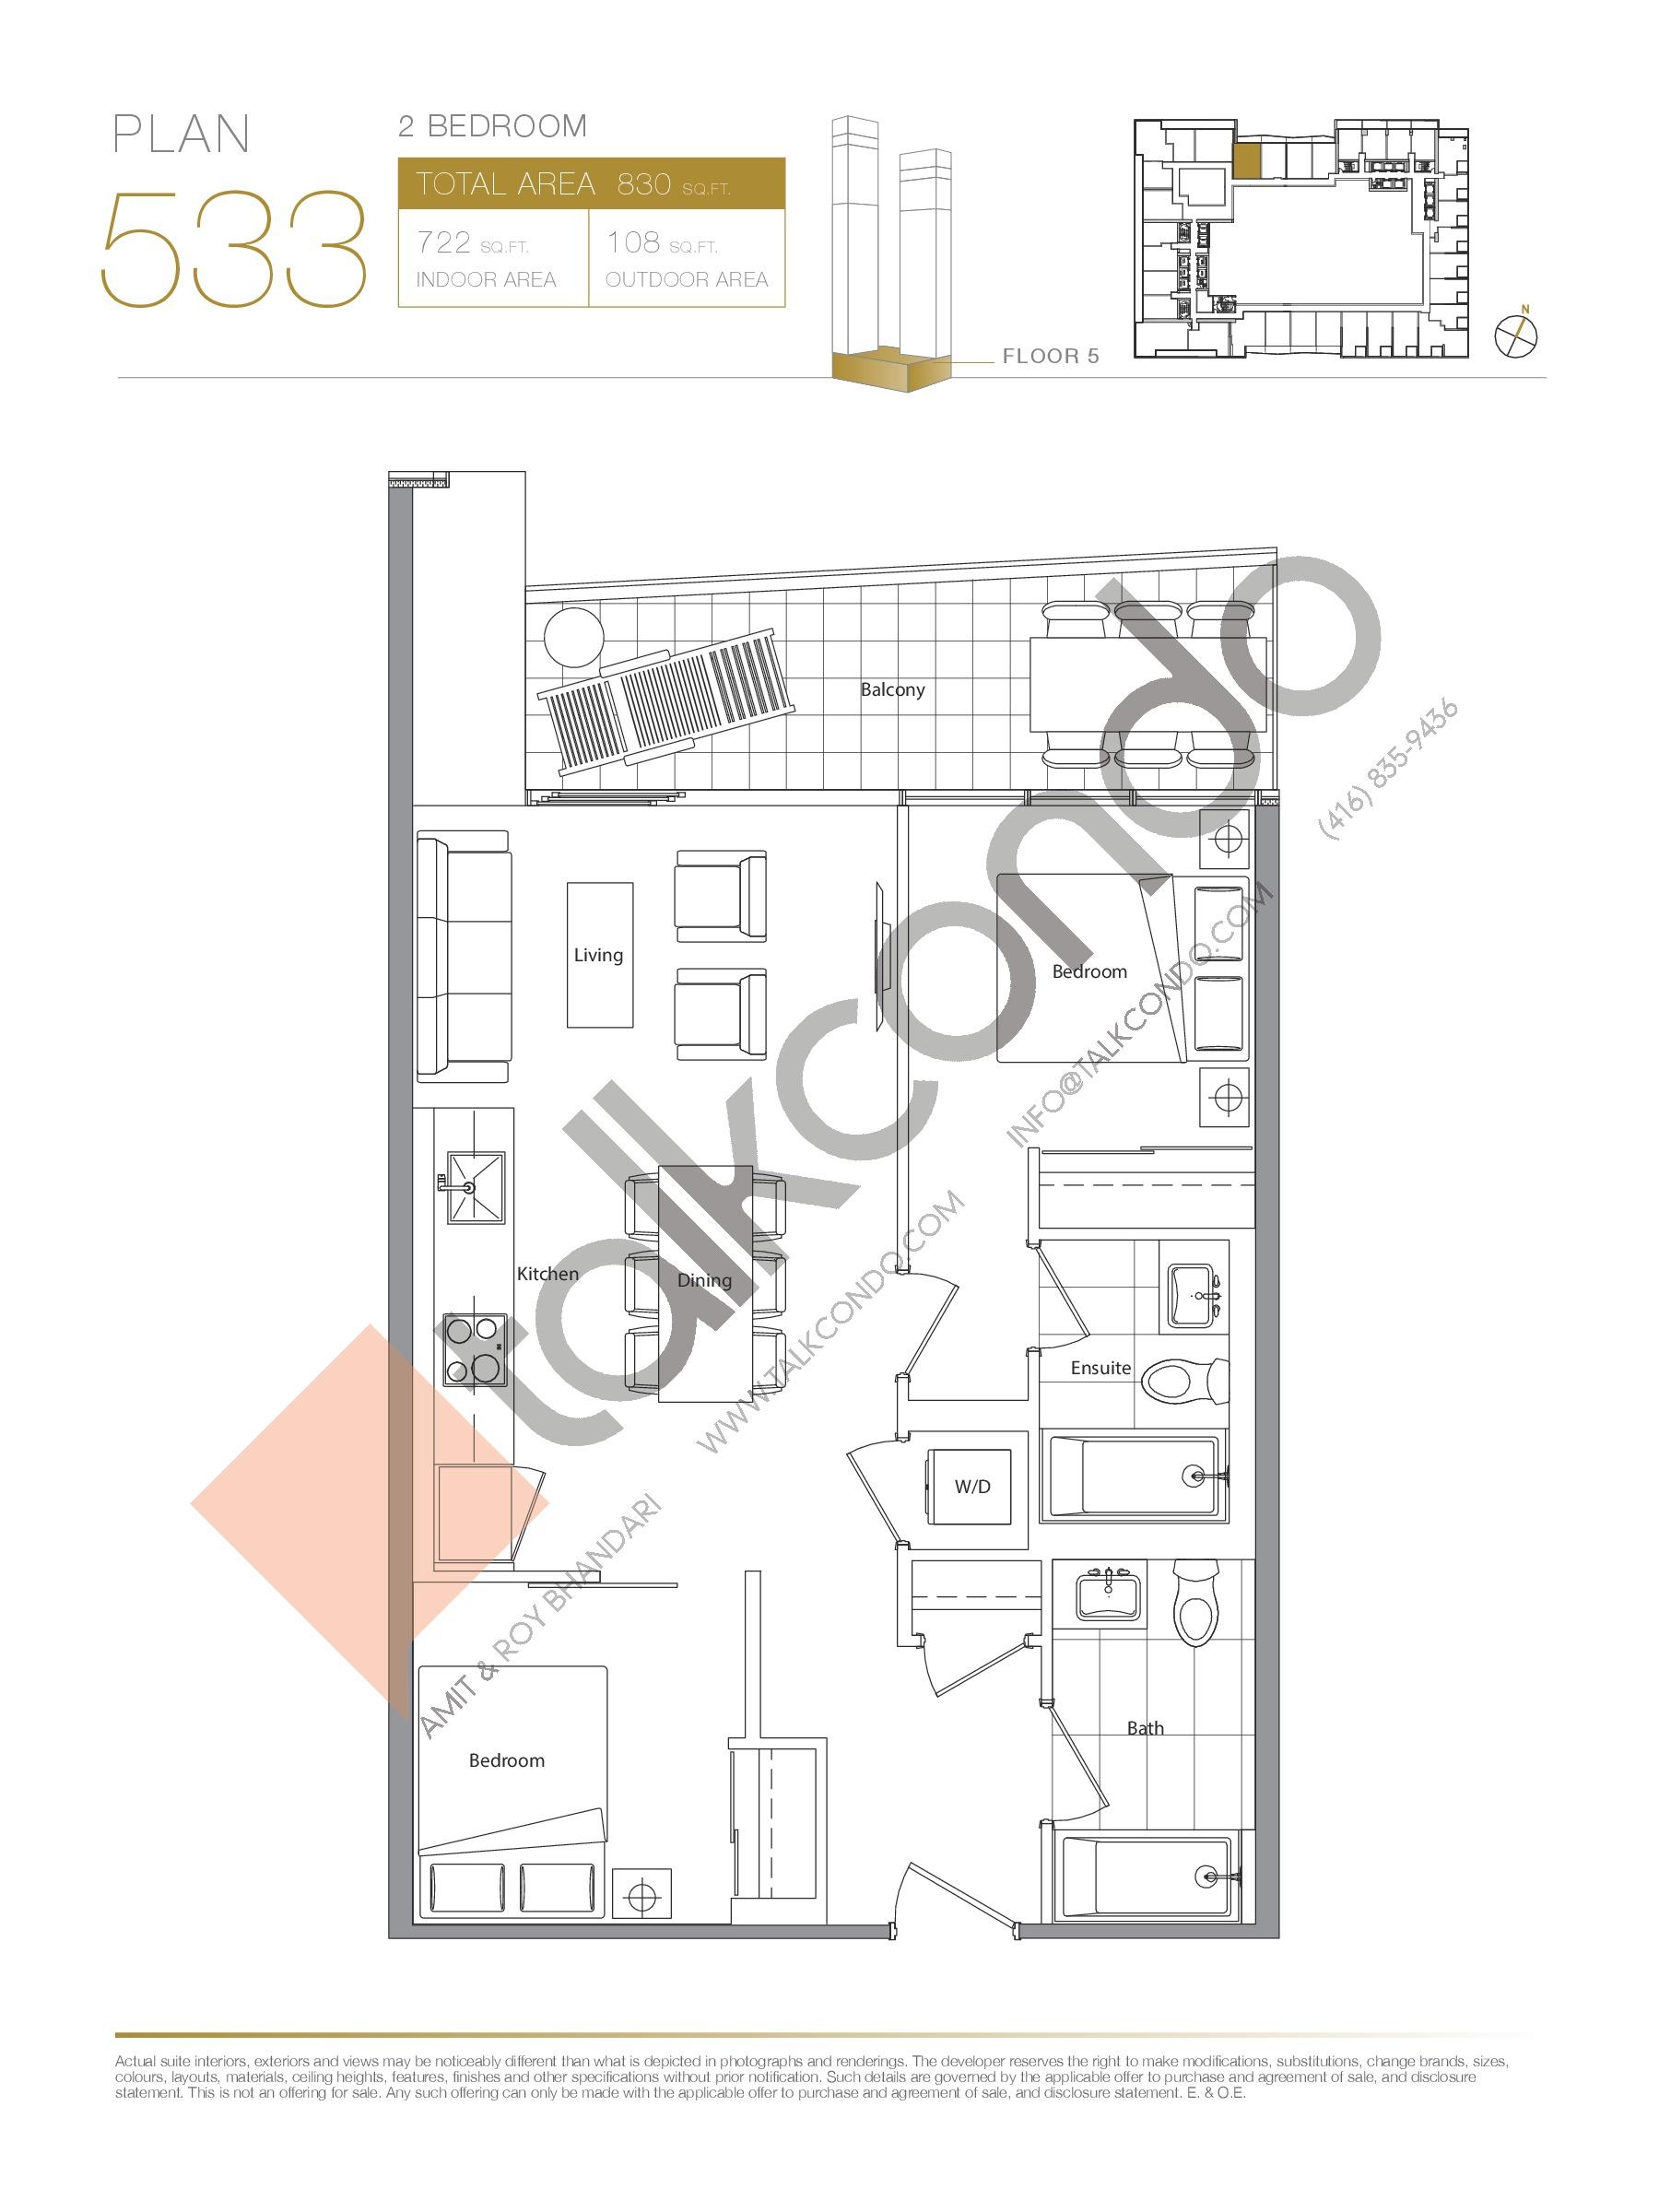 Plan 533 Floor Plan at Concord Canada House Condos - 722 sq.ft